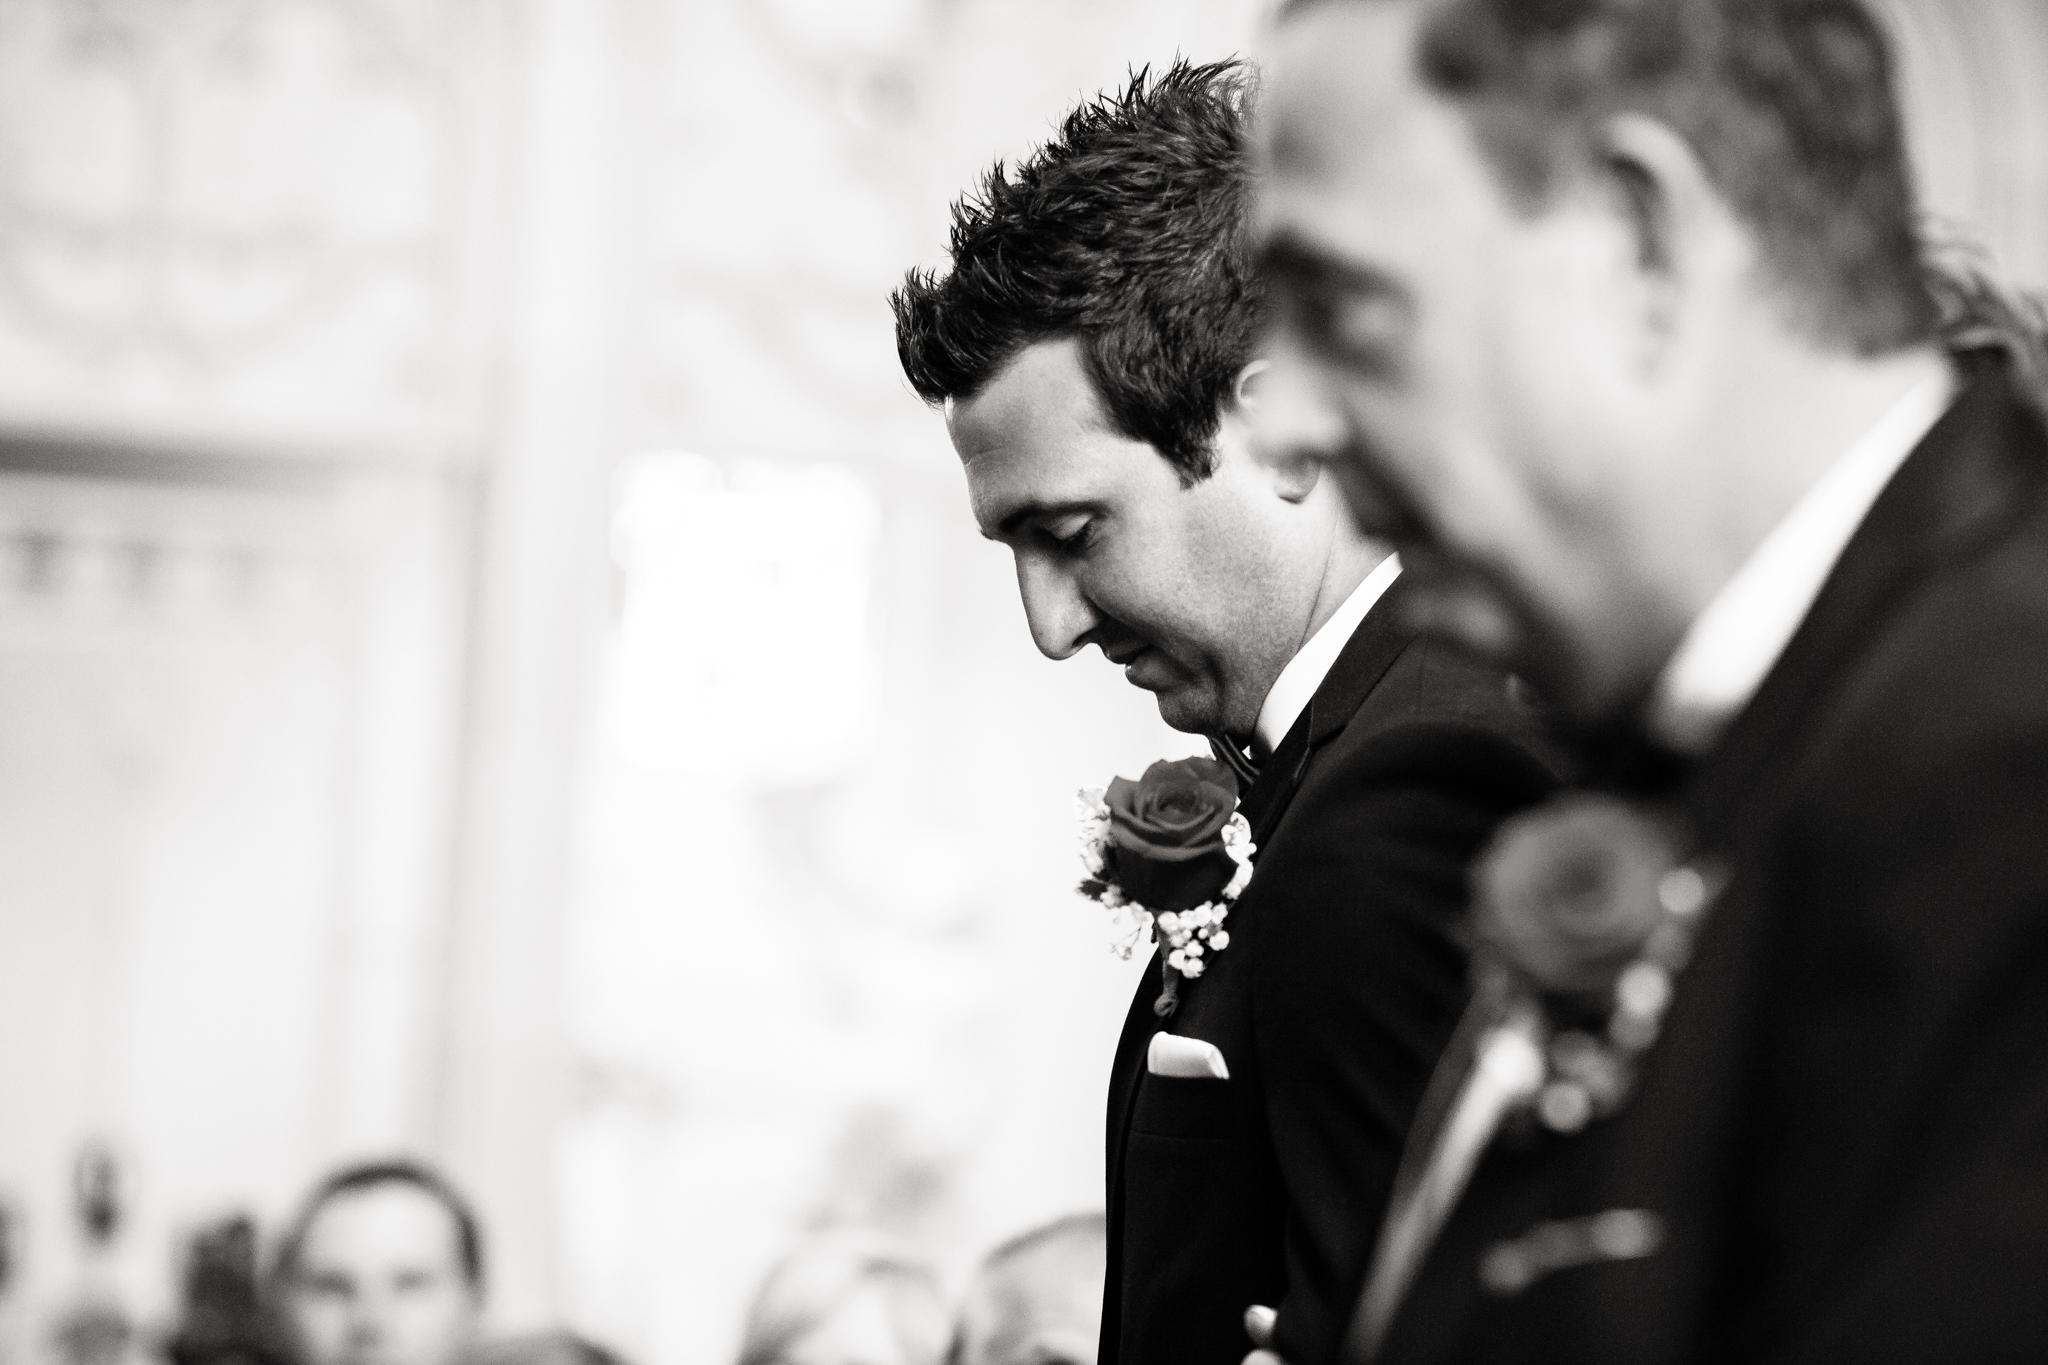 Statler-City-Buffalo-wedding-photographer- 0165bw.jpg